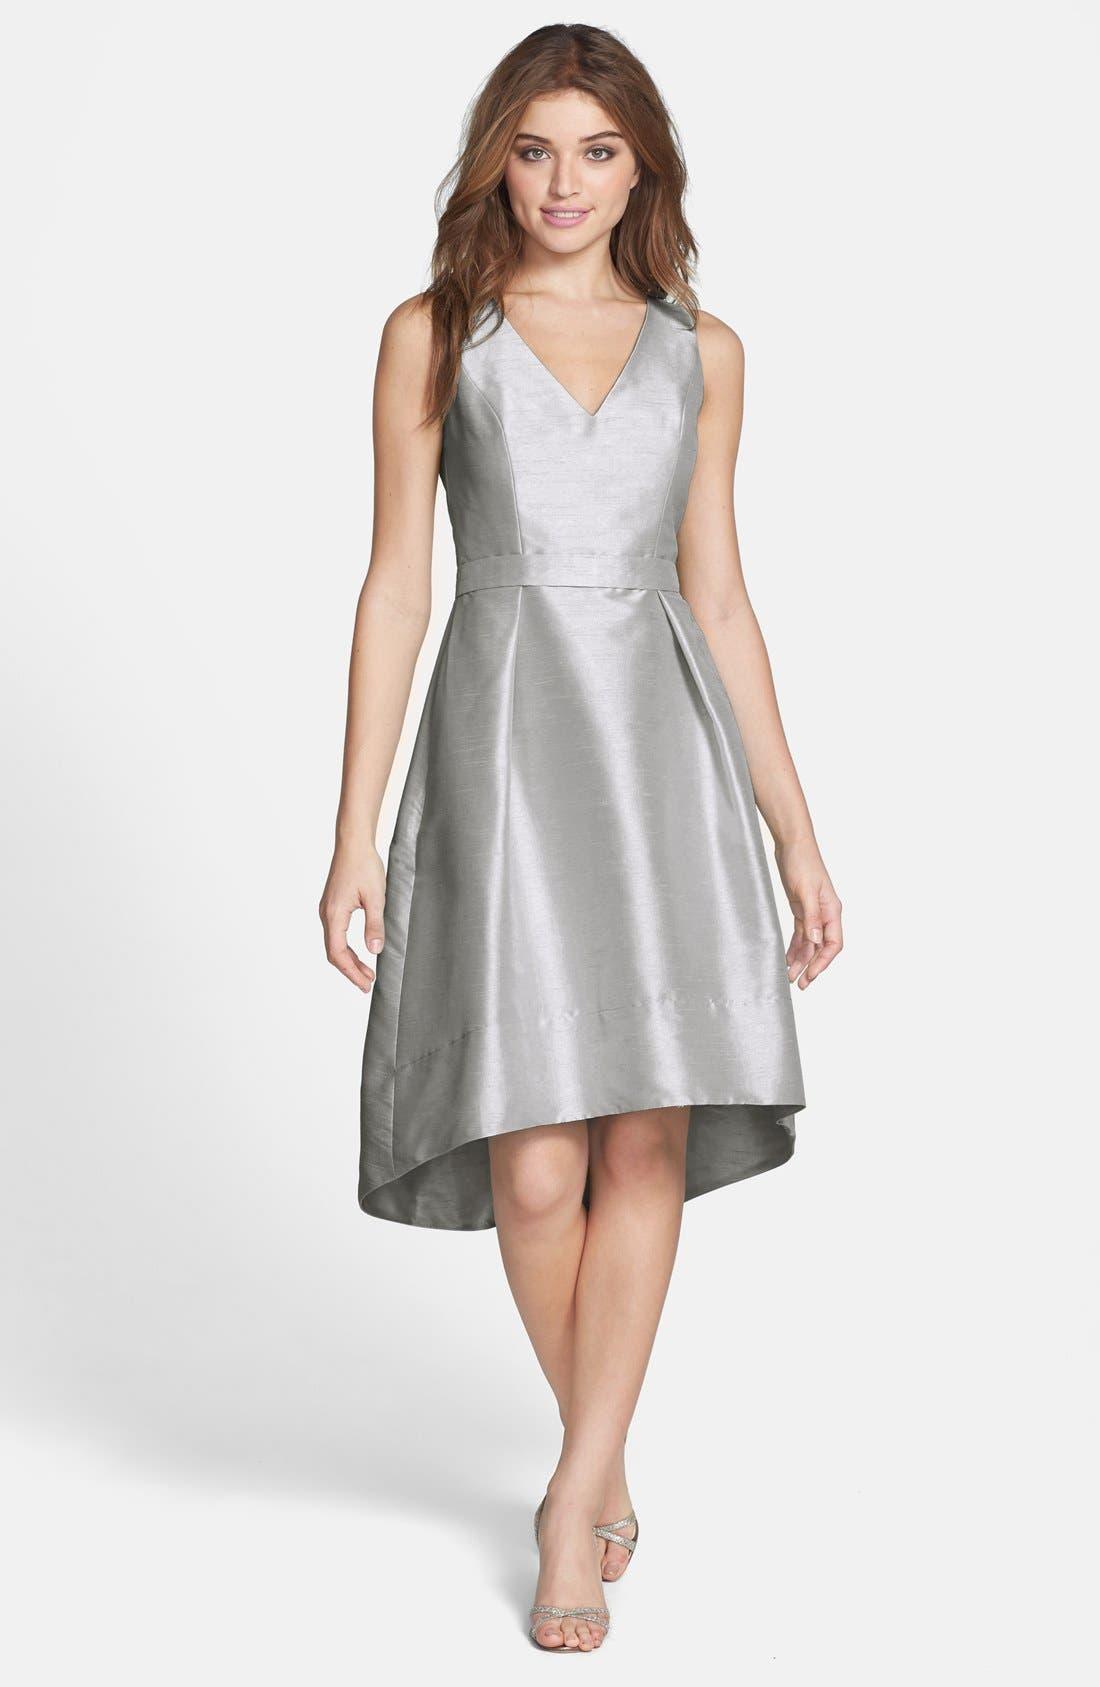 Nordstrom's Short Chiffon Dresses